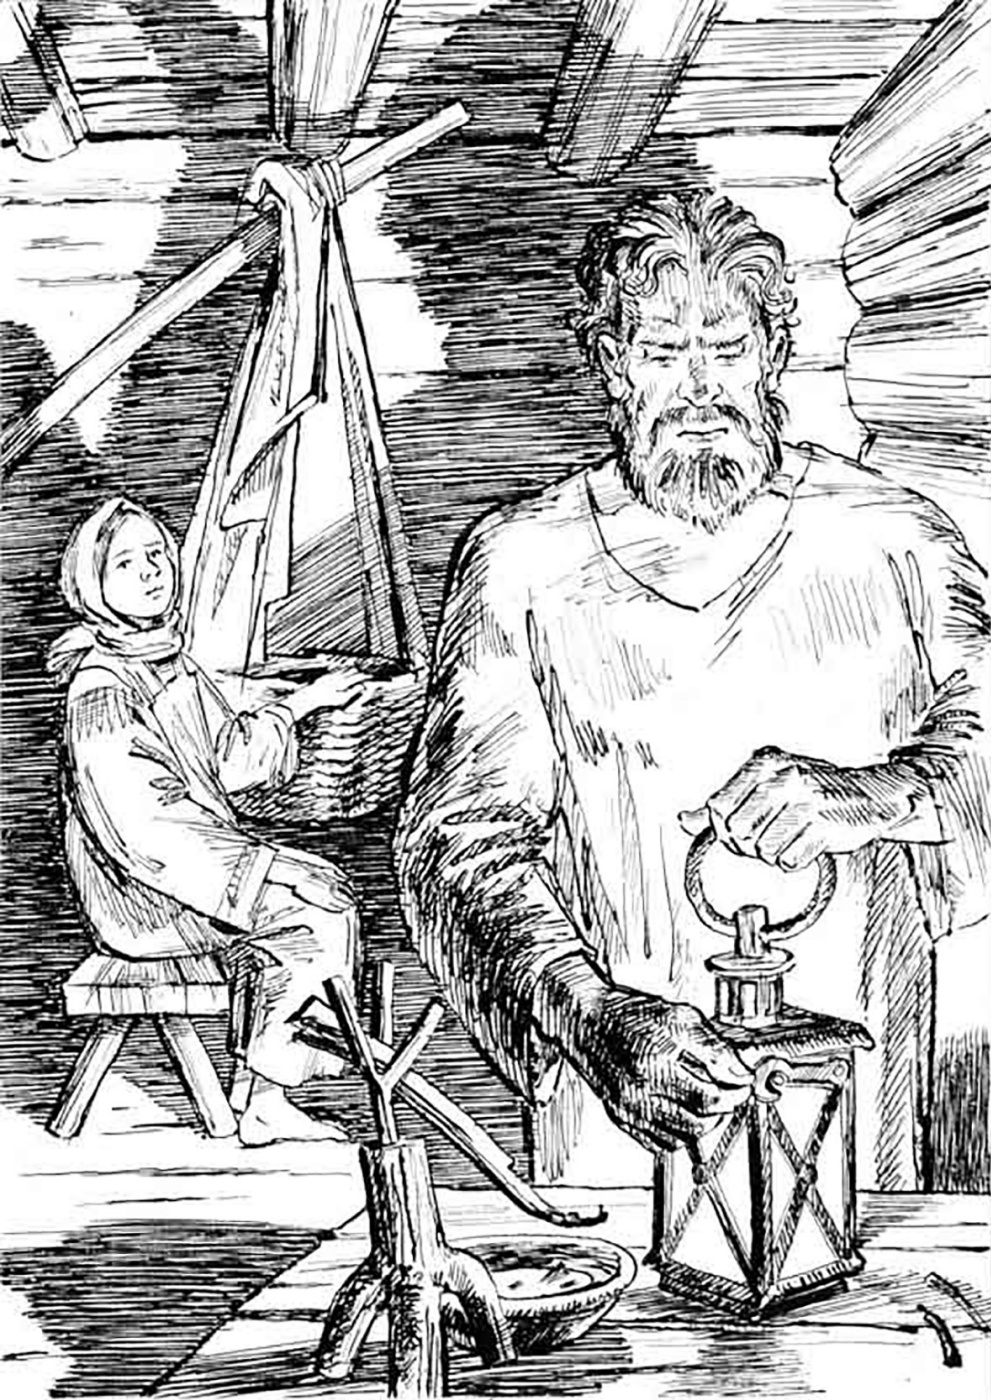 Alexander Vasilievich Kuzmin. Biryuk. I.S. Turgenev.